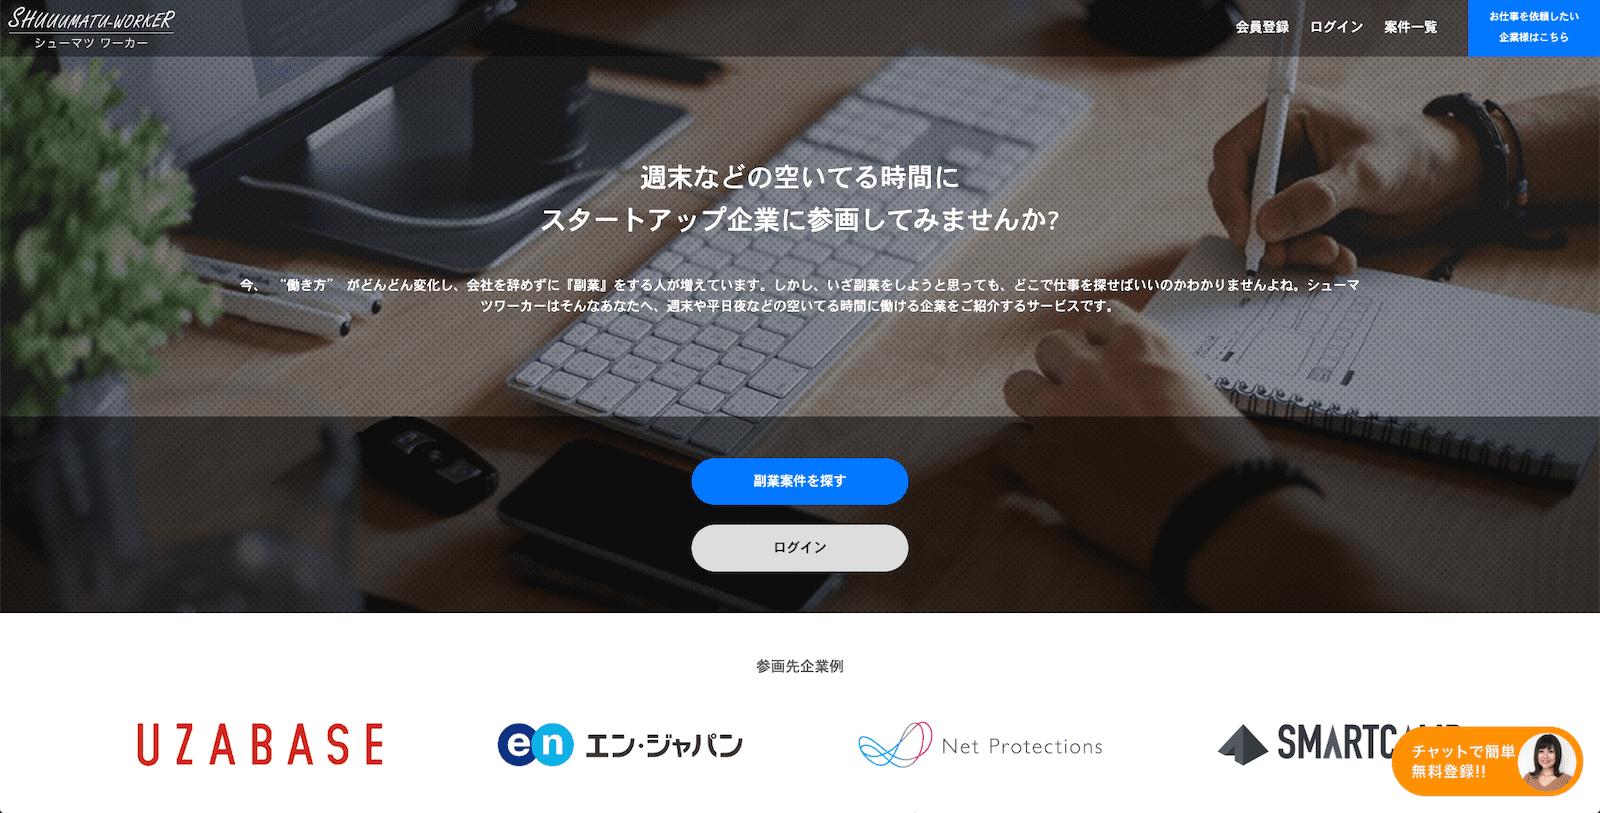 shuuumatu-worker-min